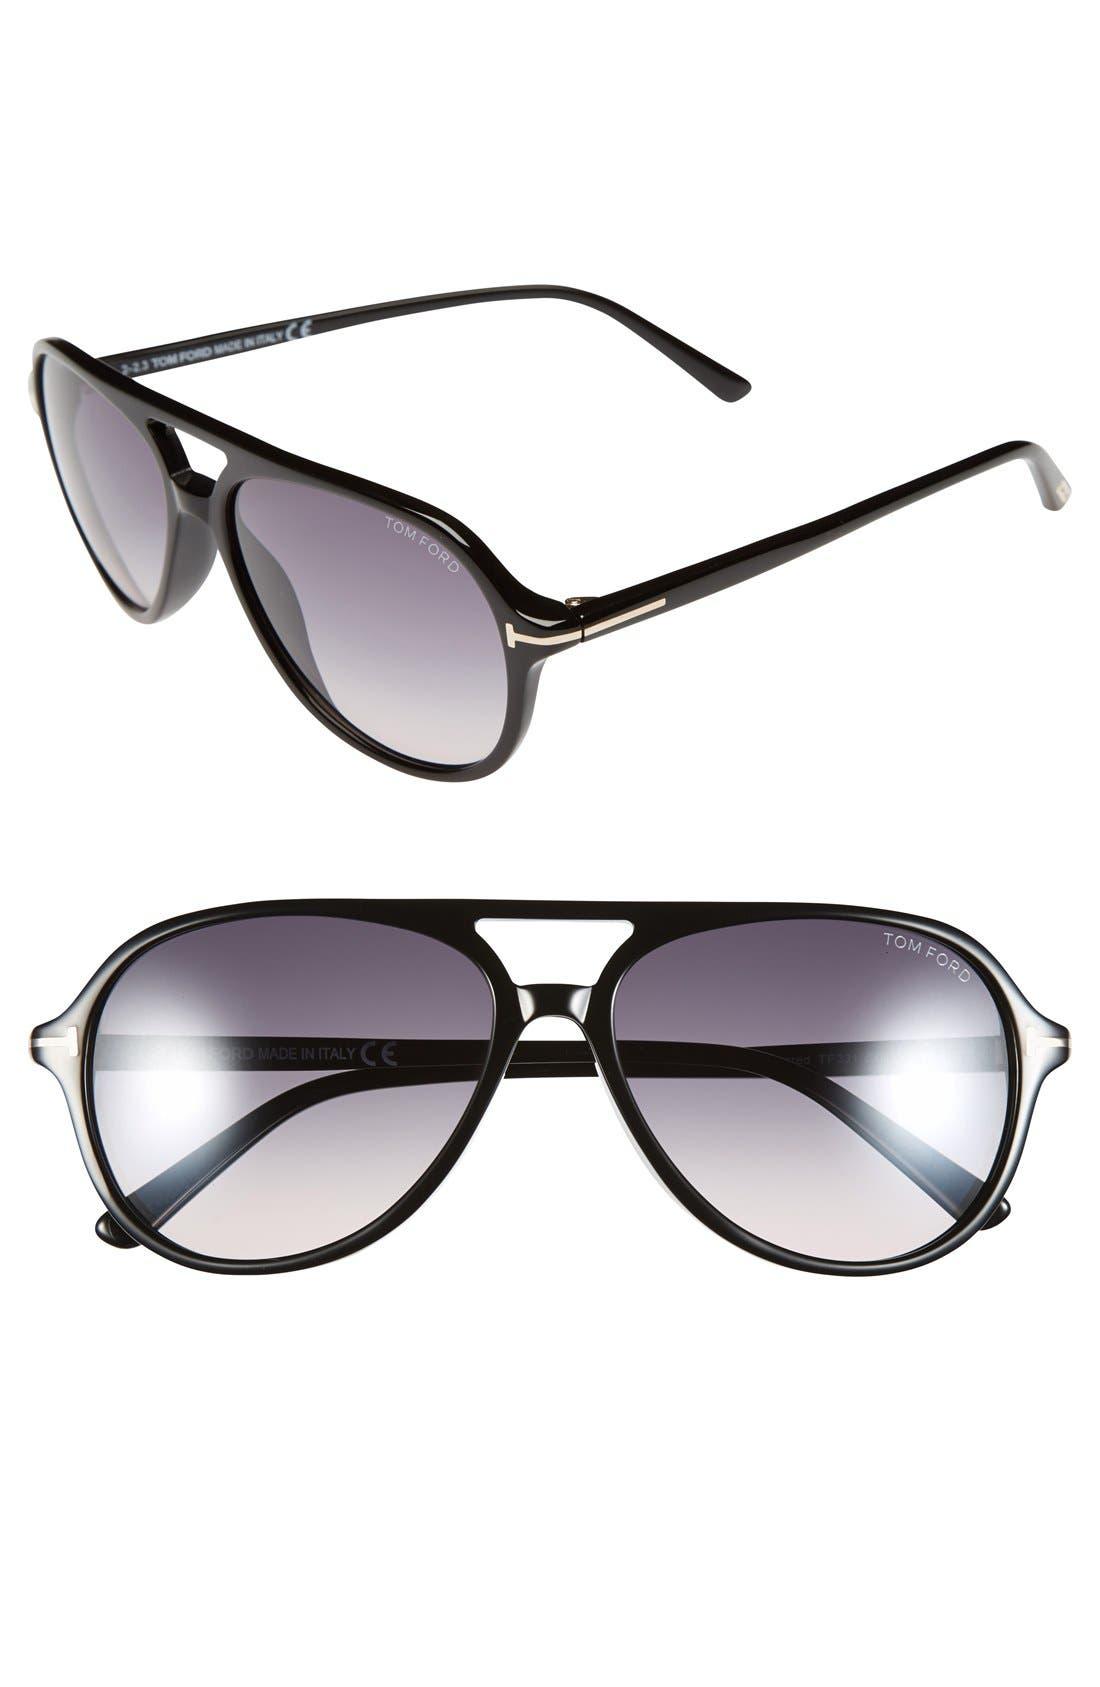 Main Image - Tom Ford 'Jared' 58mm Sunglasses